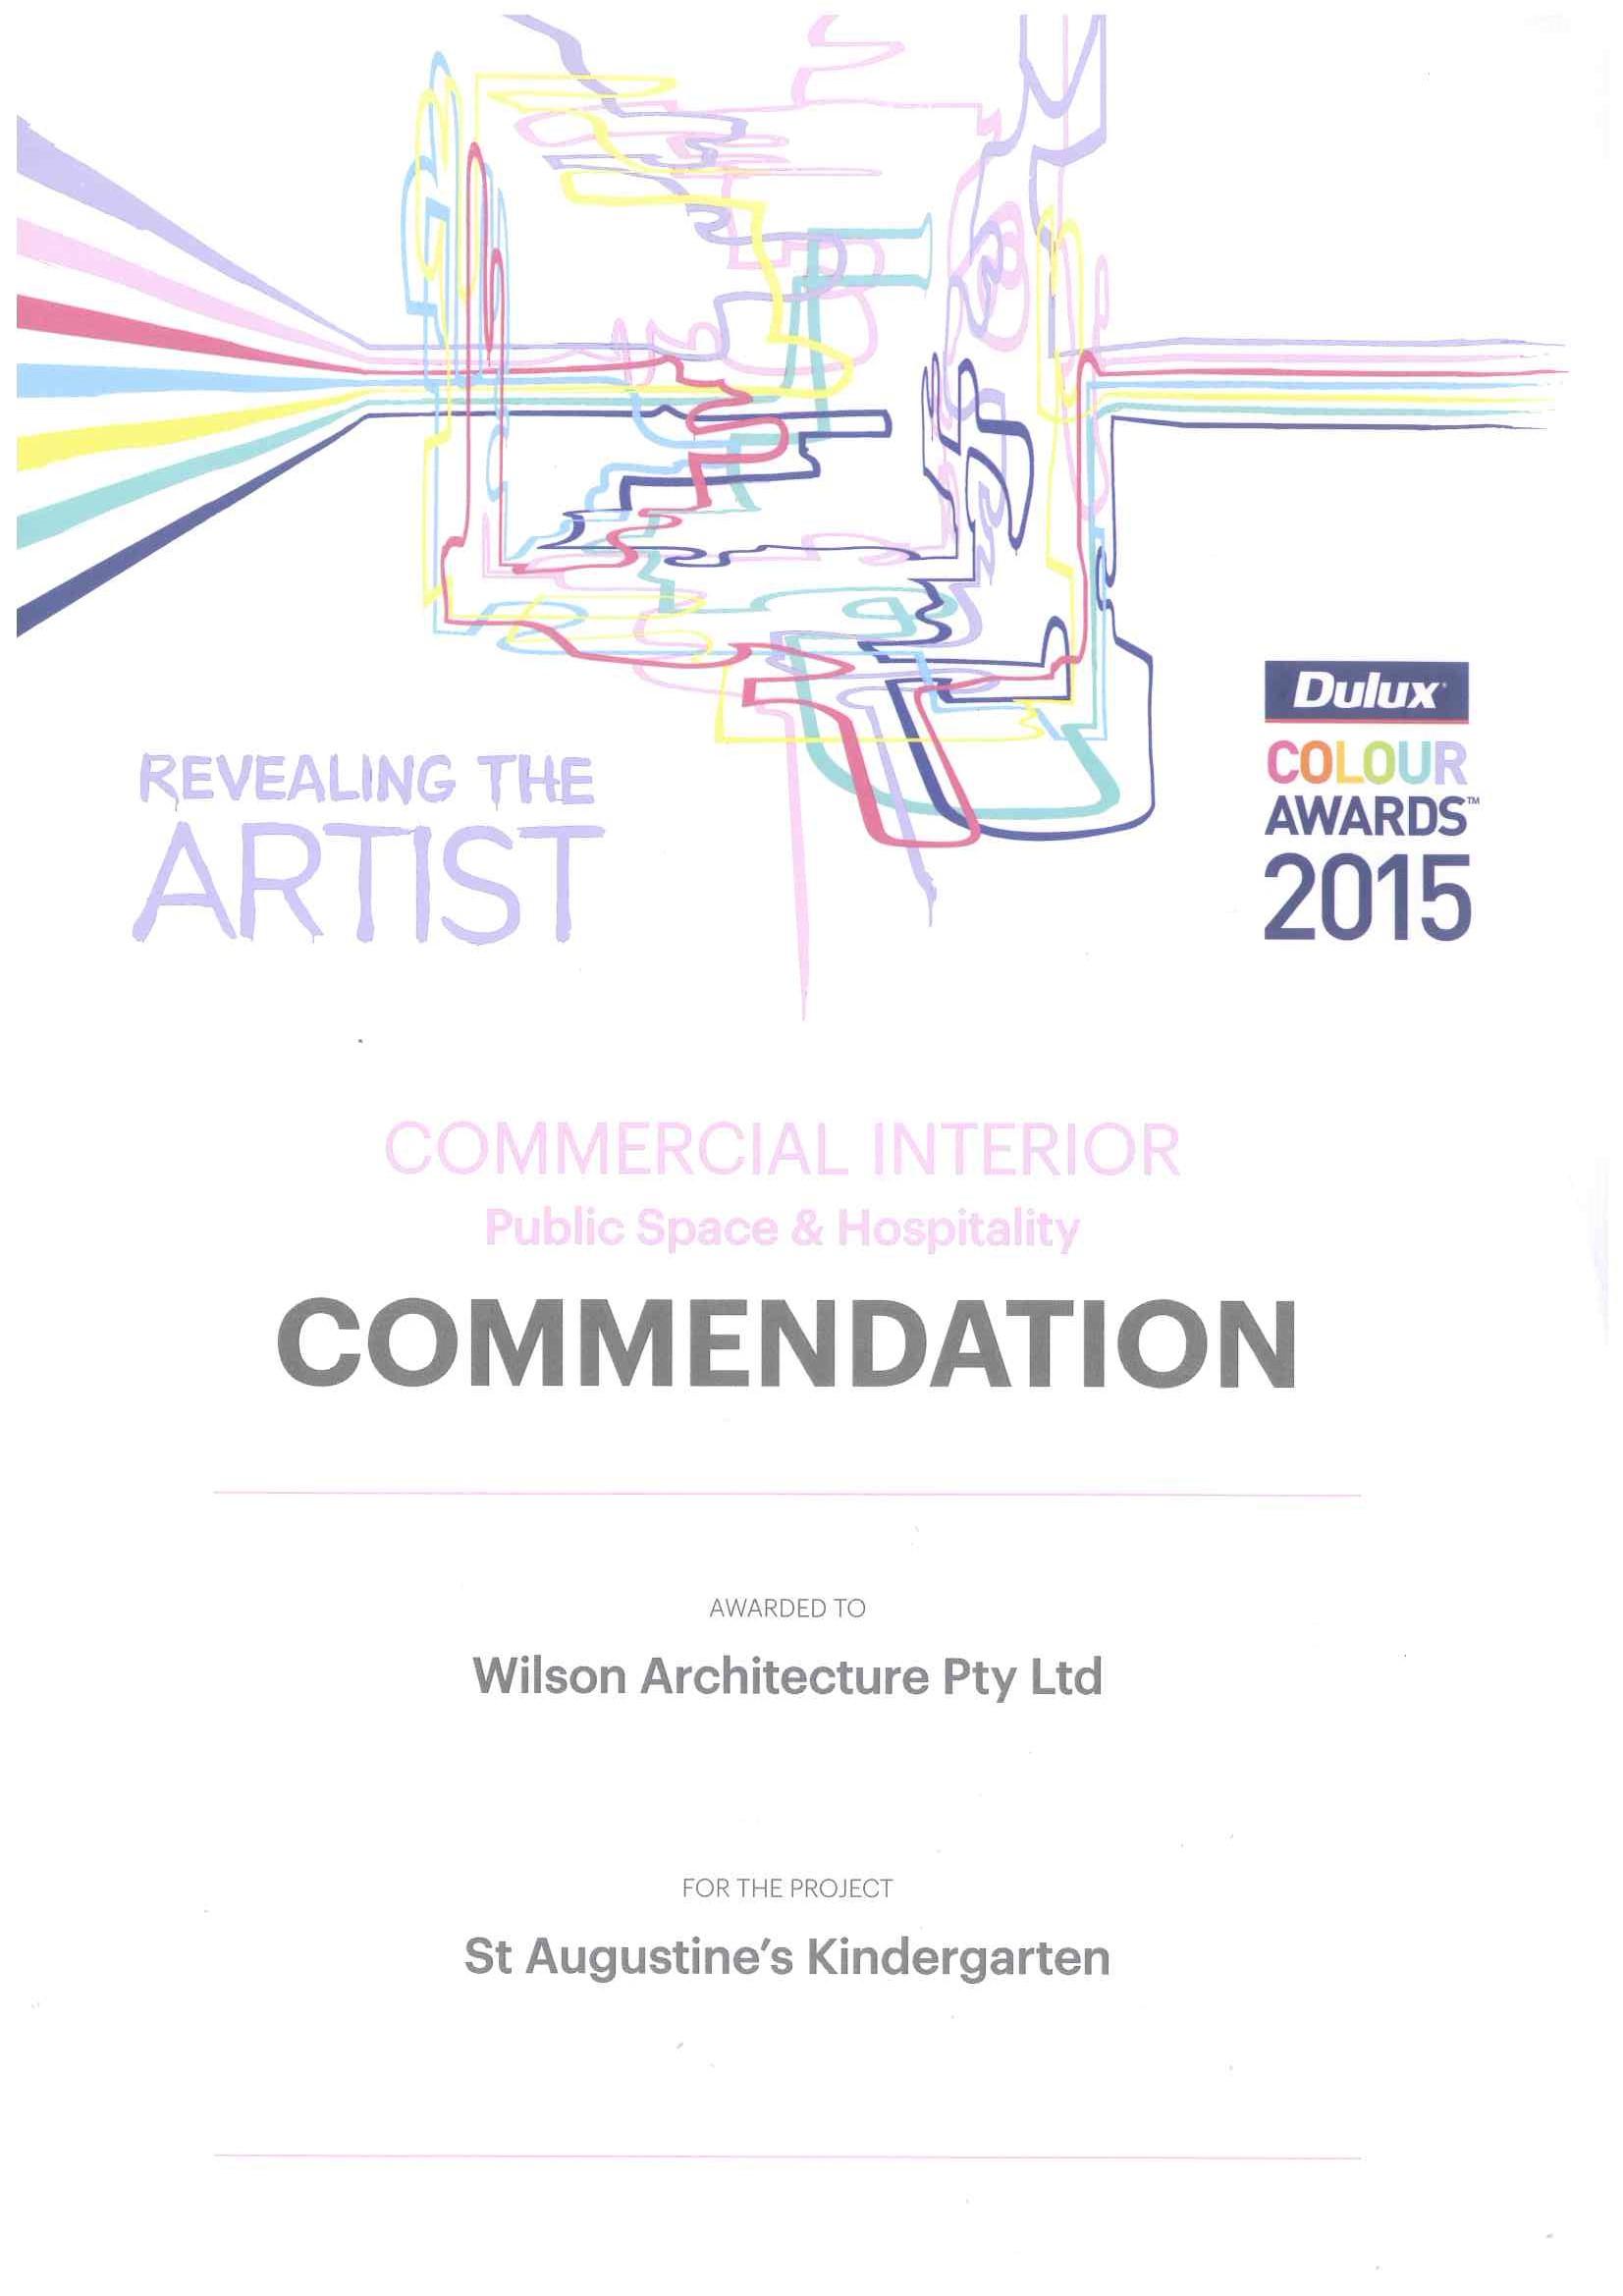 dulux colour award 2015.jpg